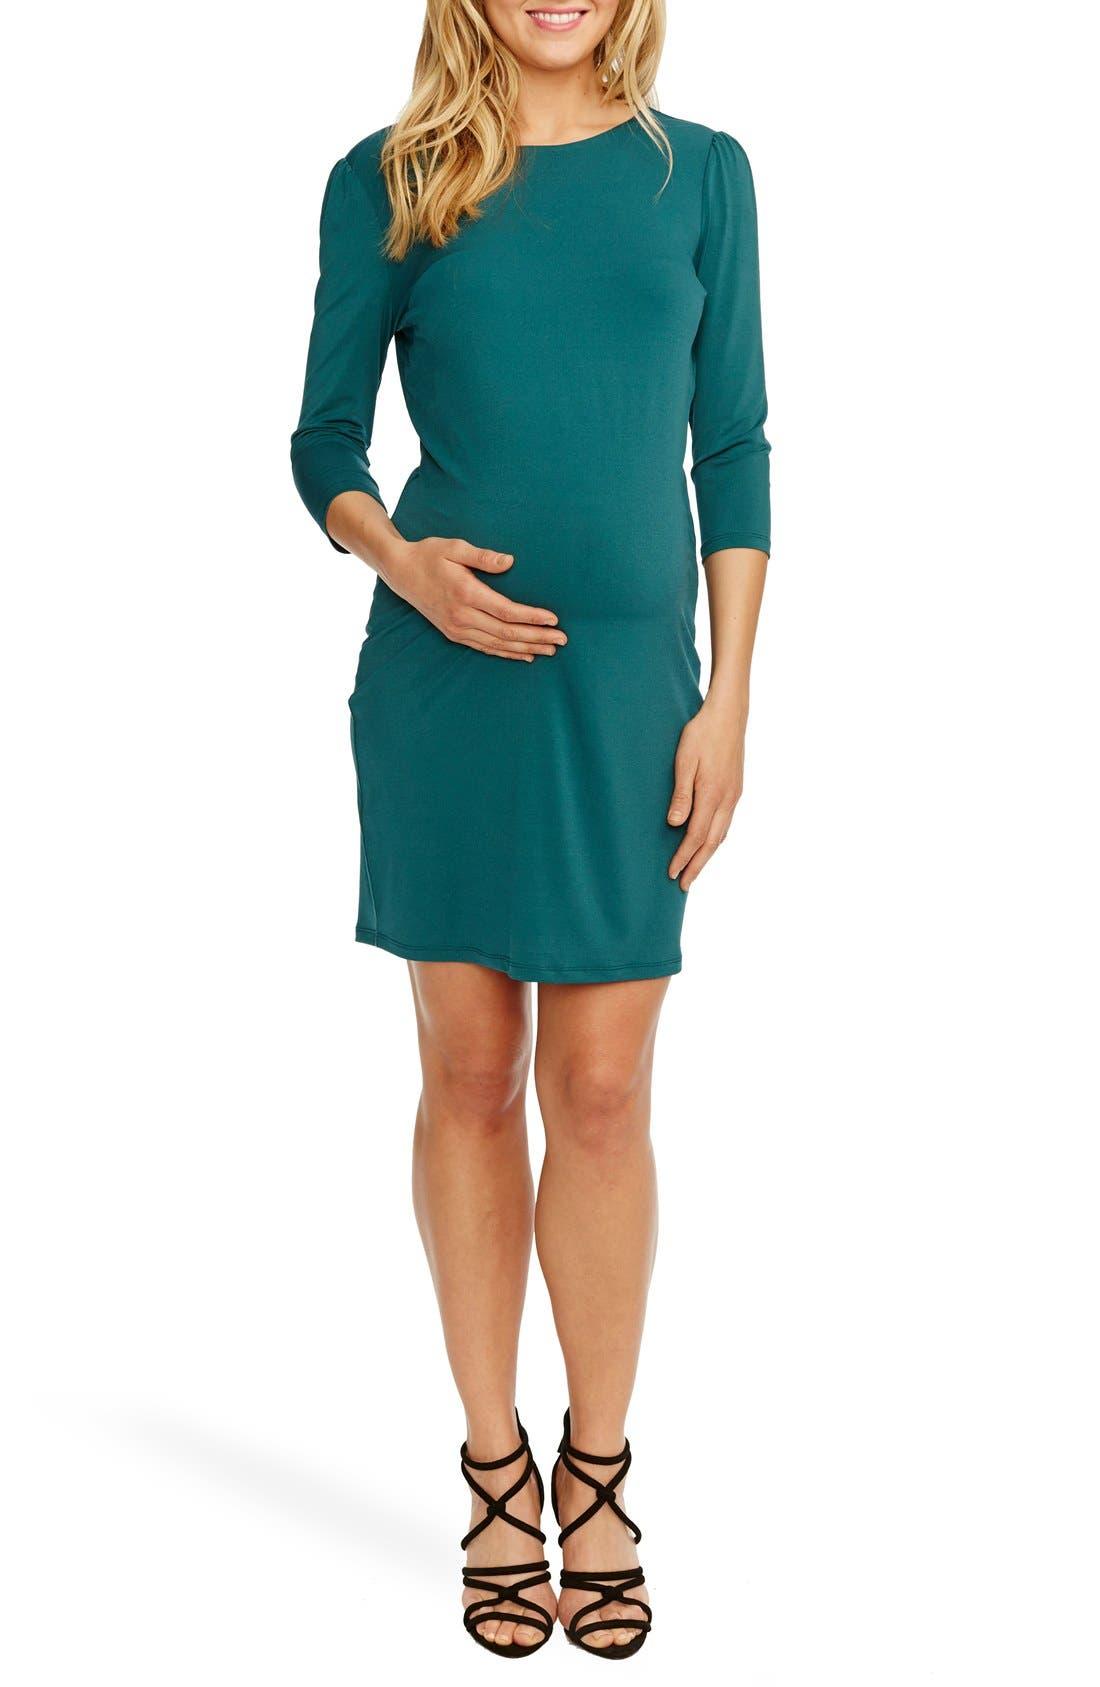 'Audra' Maternity Dress,                             Main thumbnail 1, color,                             401